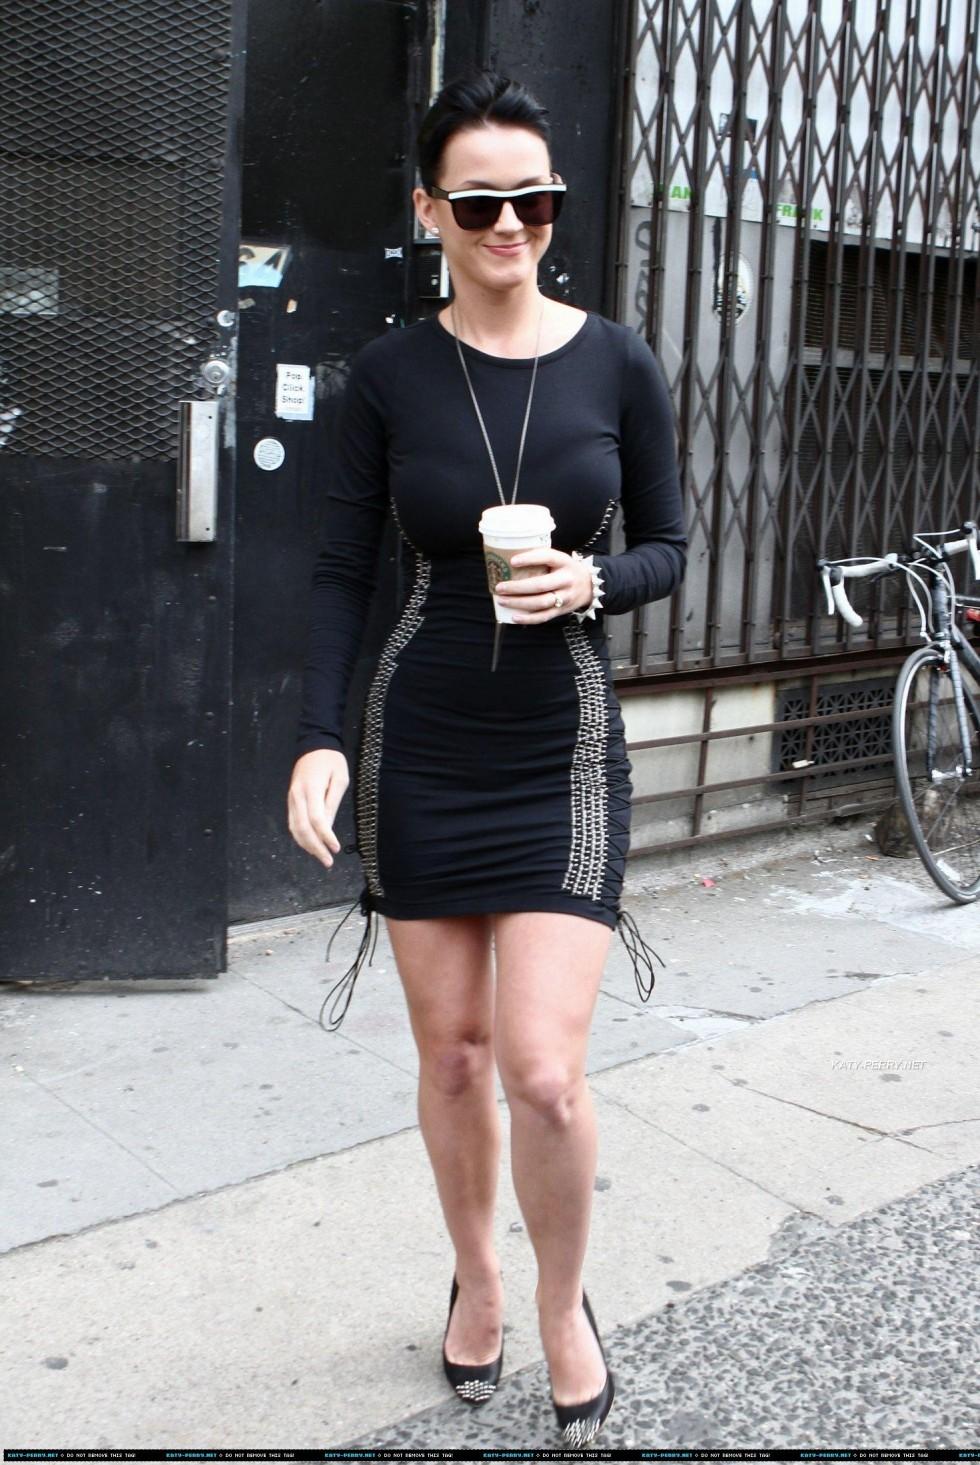 Katy Perry 2010 : katy-perry-leggy-in-black-dress-07